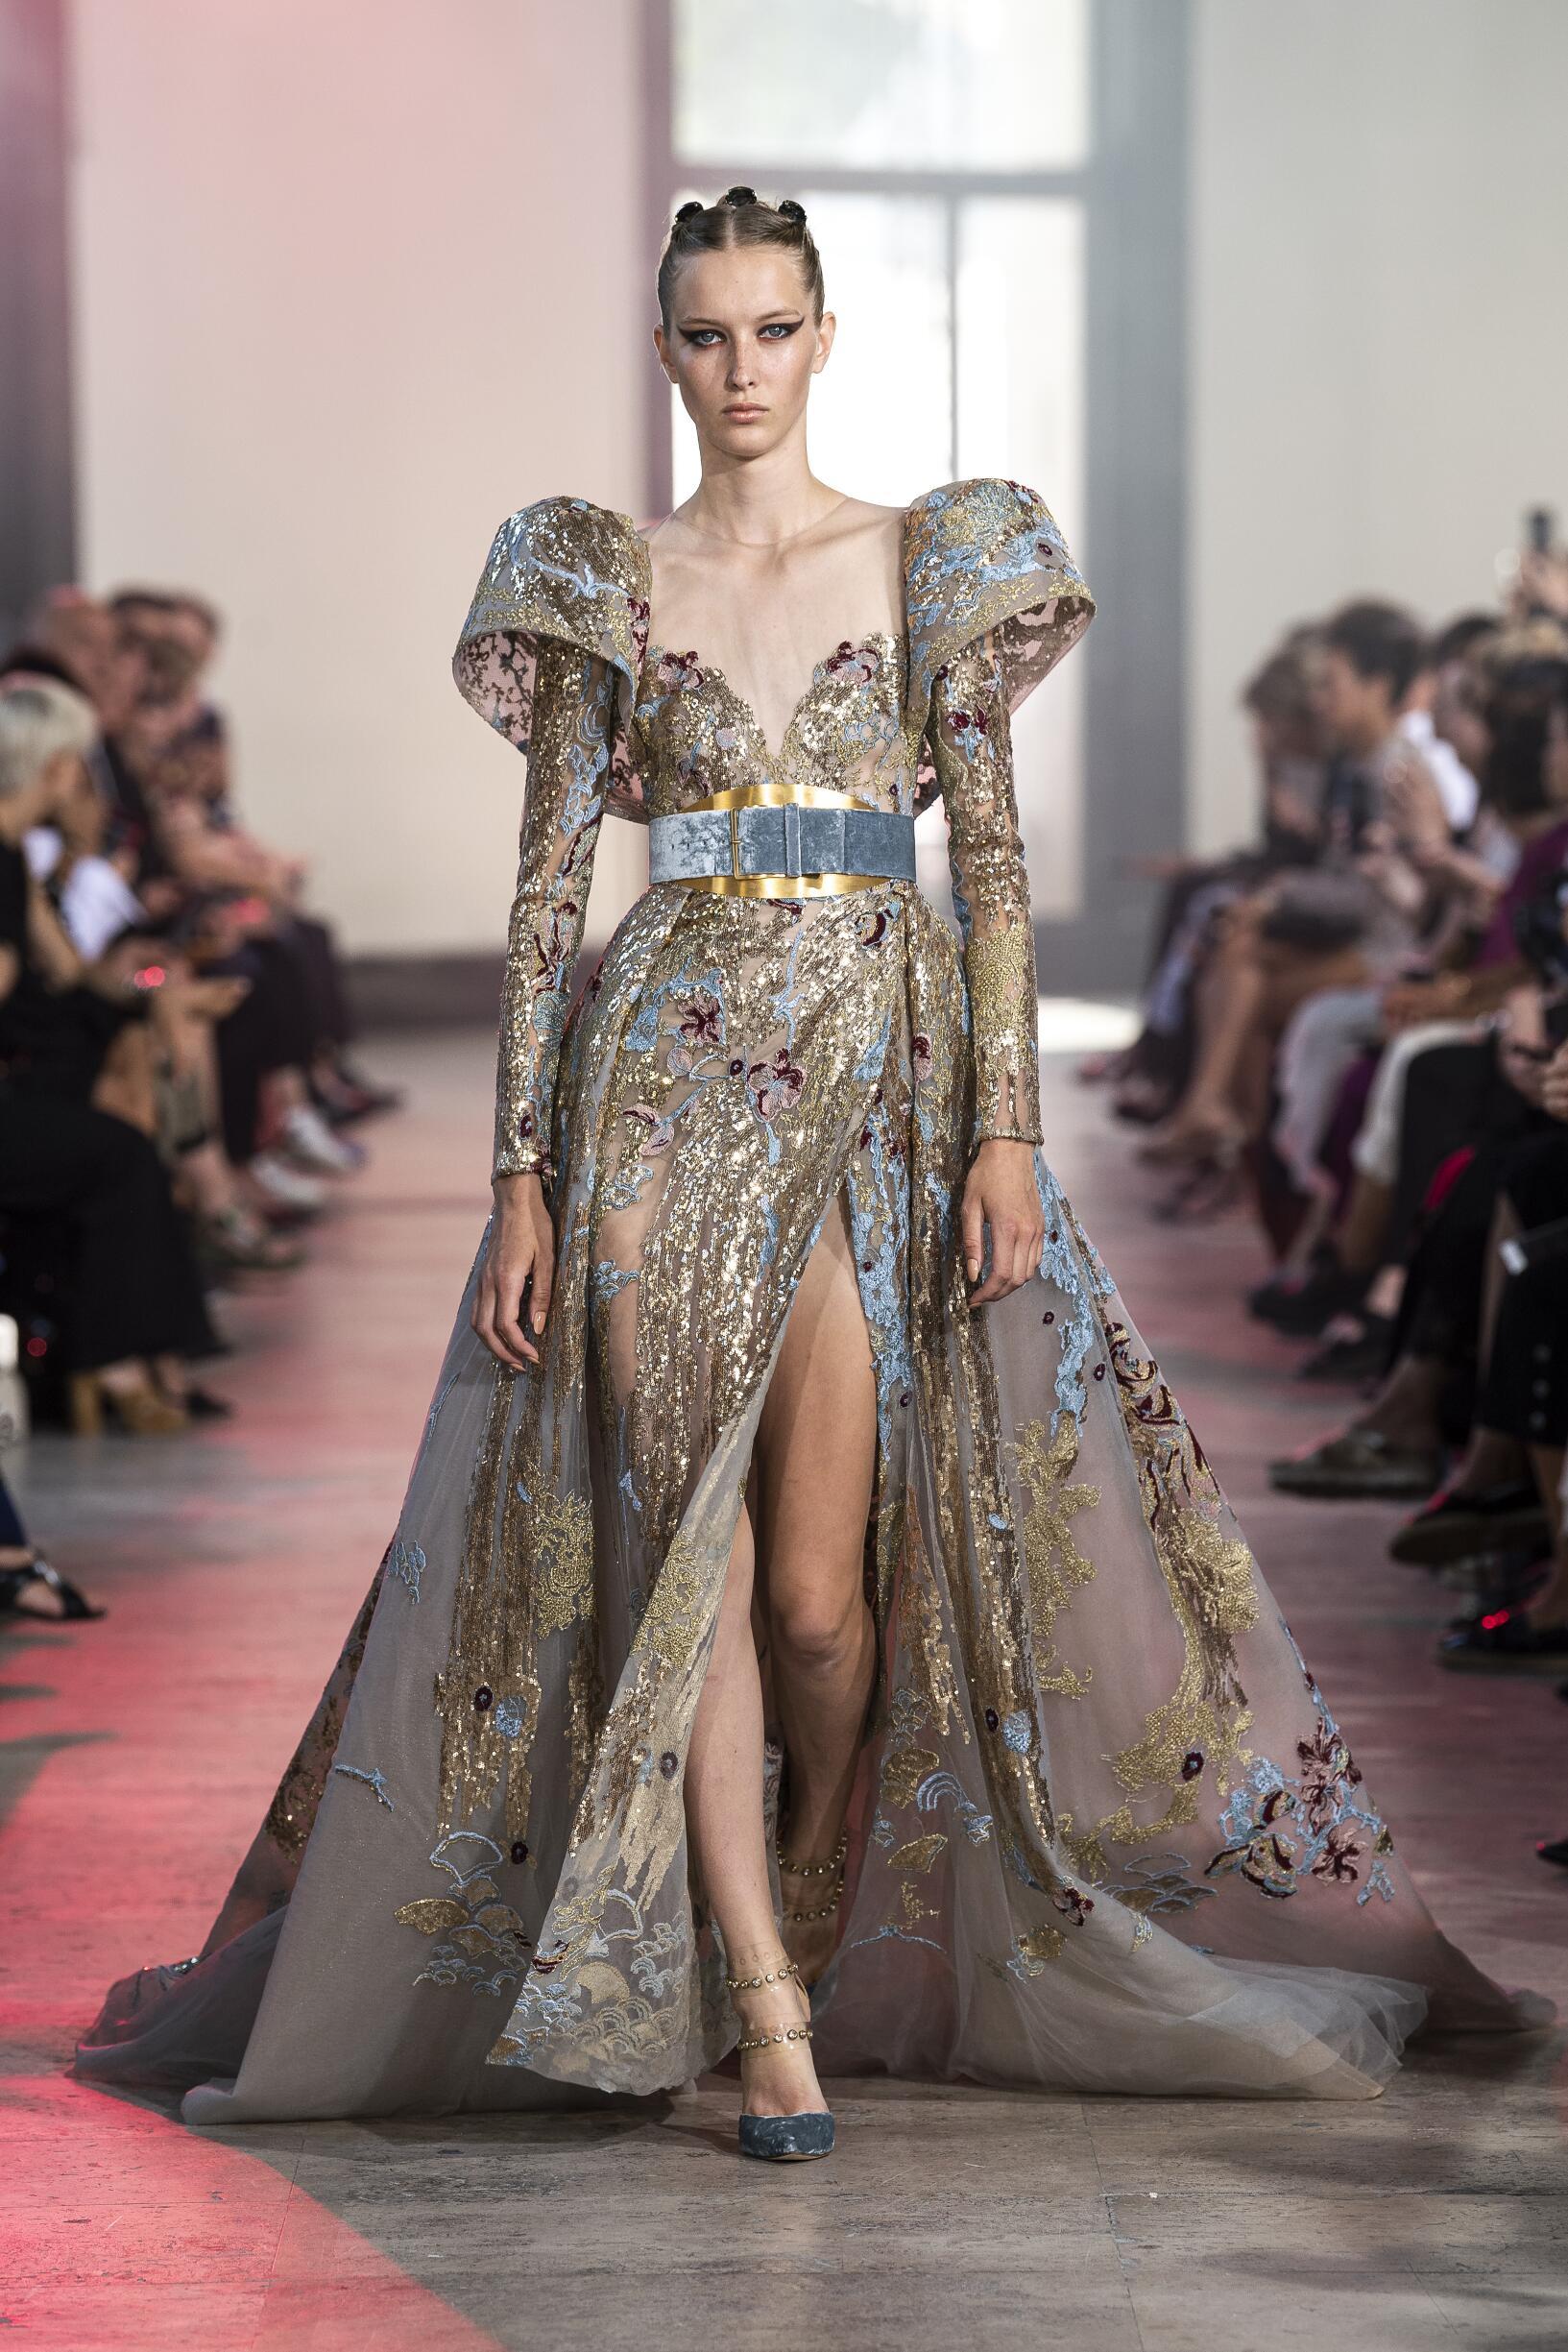 Woman FW 2019 Elie Saab Haute Couture Show Paris Fashion Week